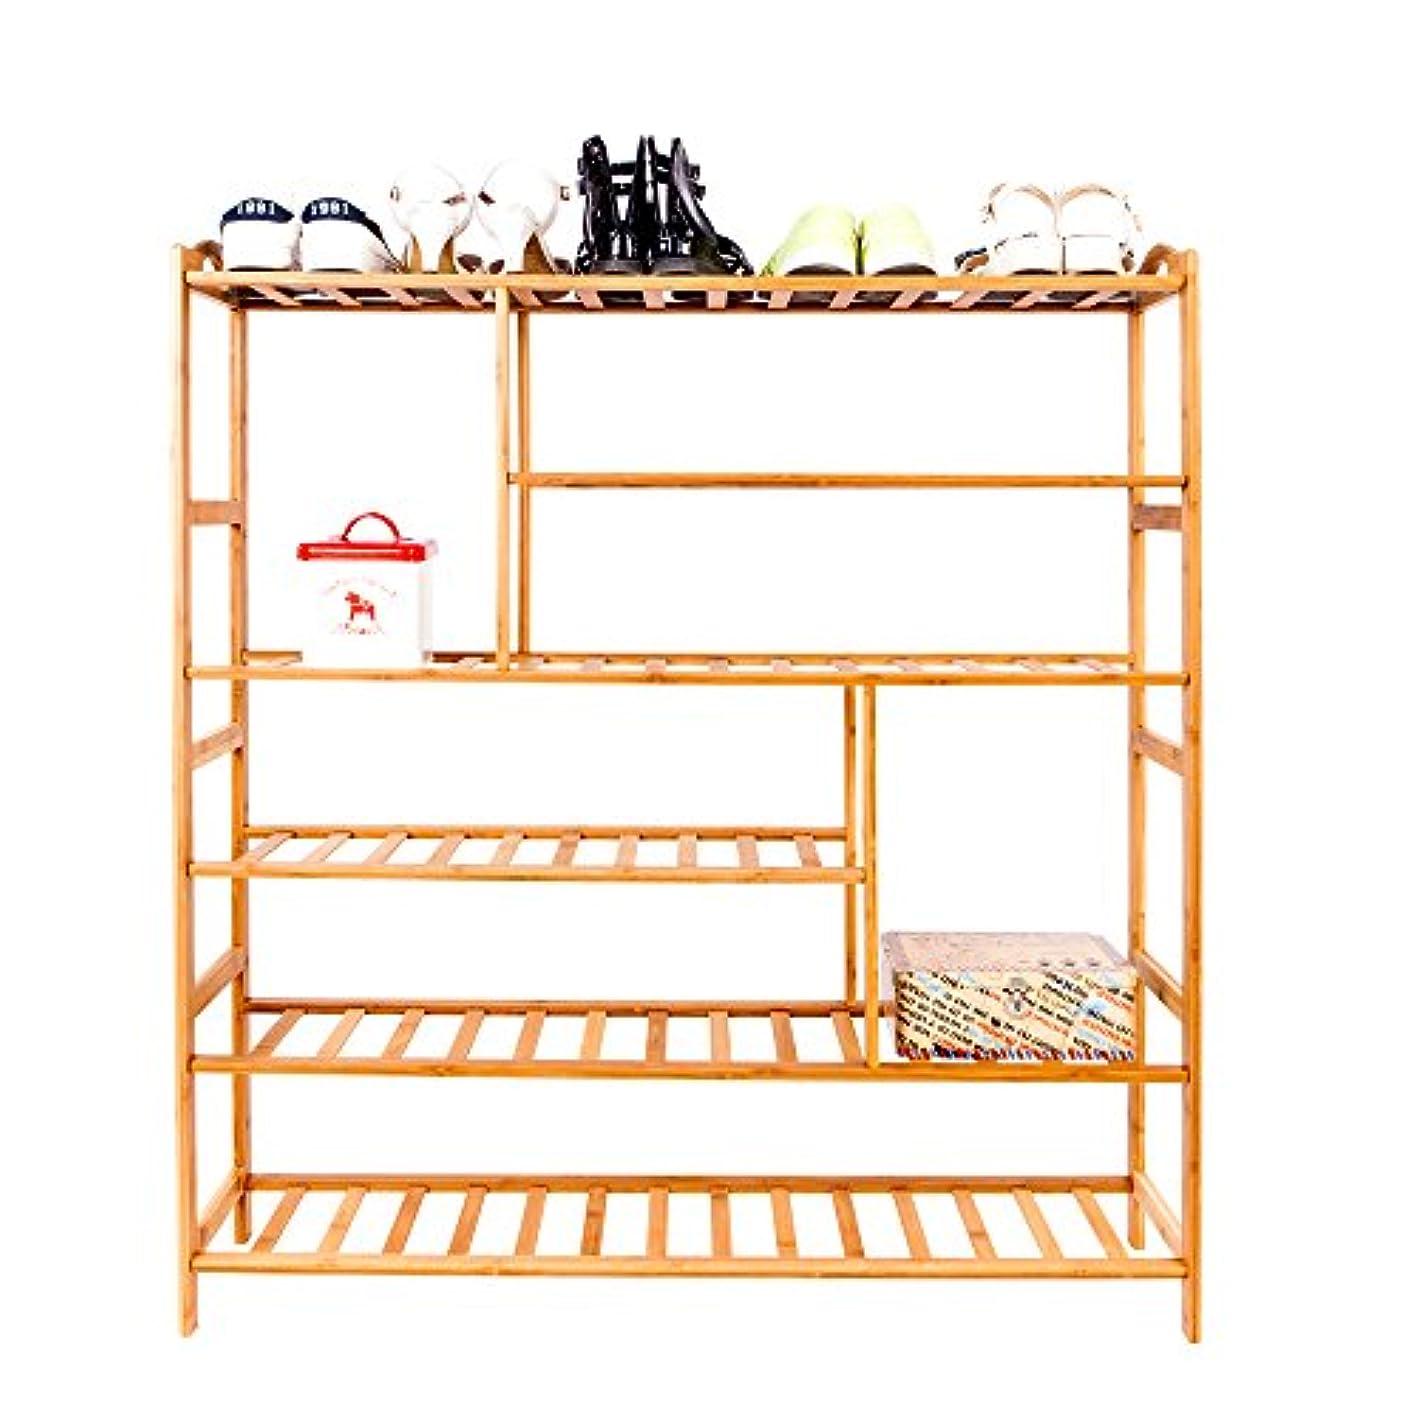 Cogihome 6 Tiers 30 Pairs Bamboo Shoe Rack, Mutifunctional Shoe Storage Organizer Book Shelf Display Racks Closets for Entry Hallway, Bedroom, Balcony